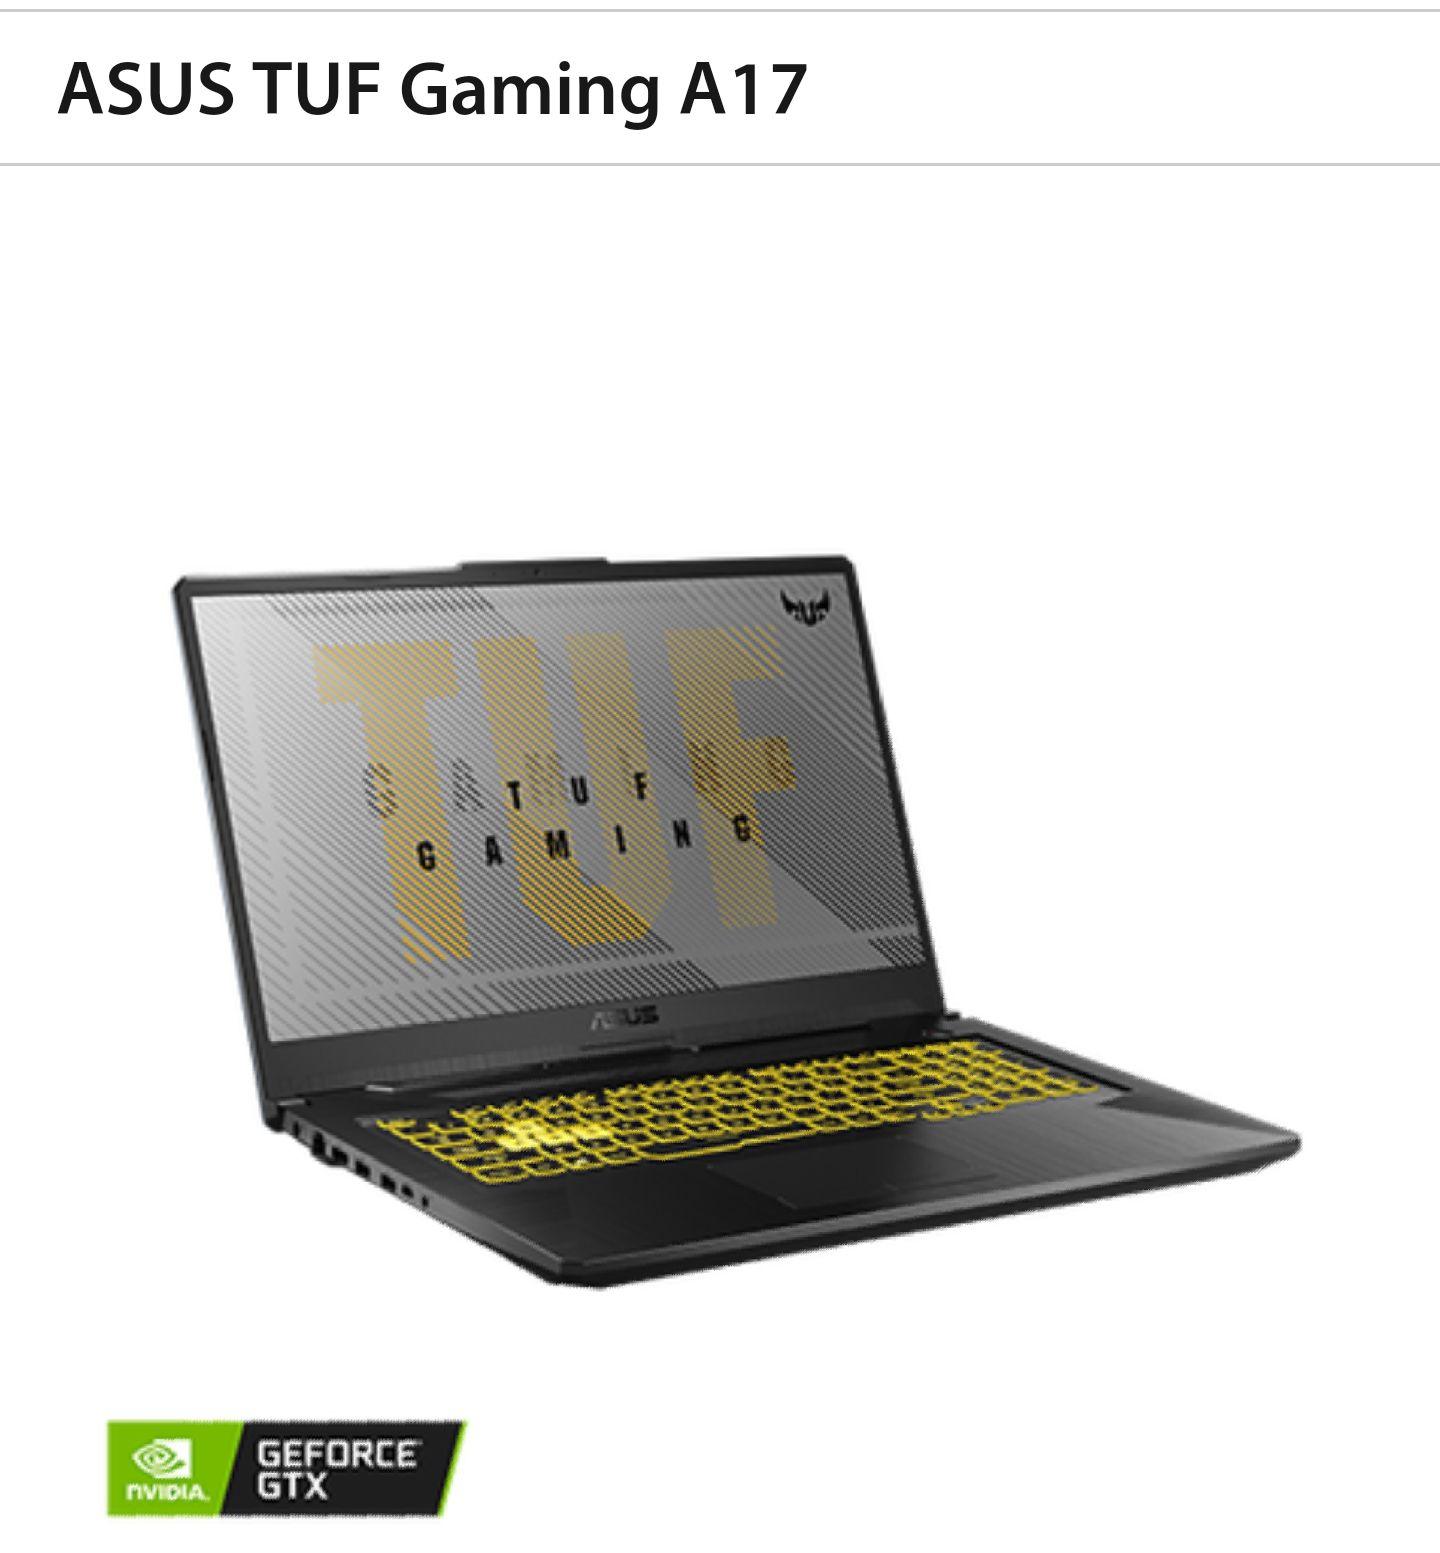 "PC Portable 17.3"" Asus TUF Gaming A17 - Full HD, Ryzen 7 4800H, 8 Go RAM, 512 Go SSD, GTX 1650 Ti, Windows 10"